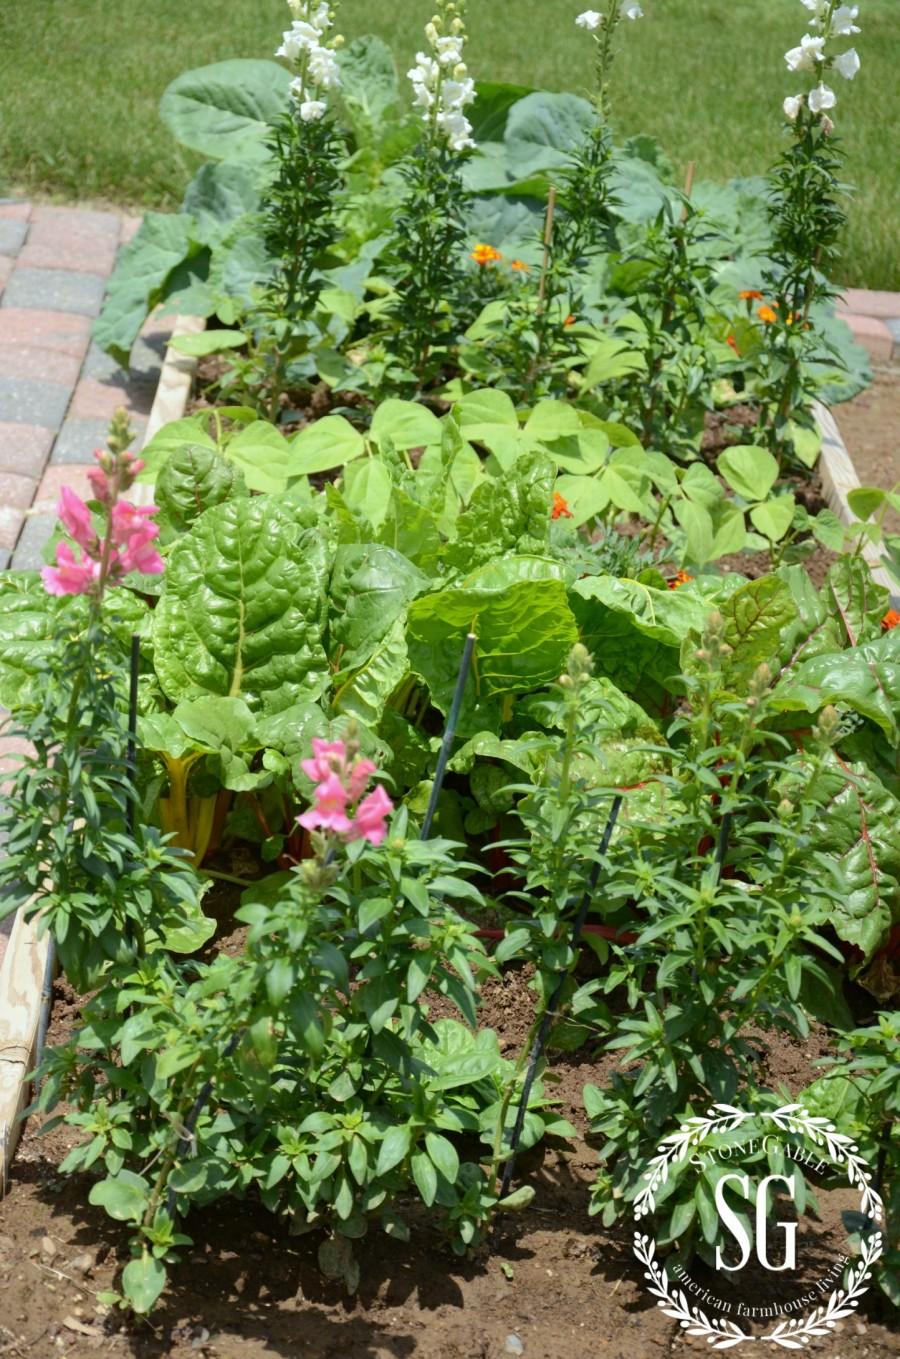 VEGETABLE GARDEN-box with veggies and a walkway-stonegableblog.com